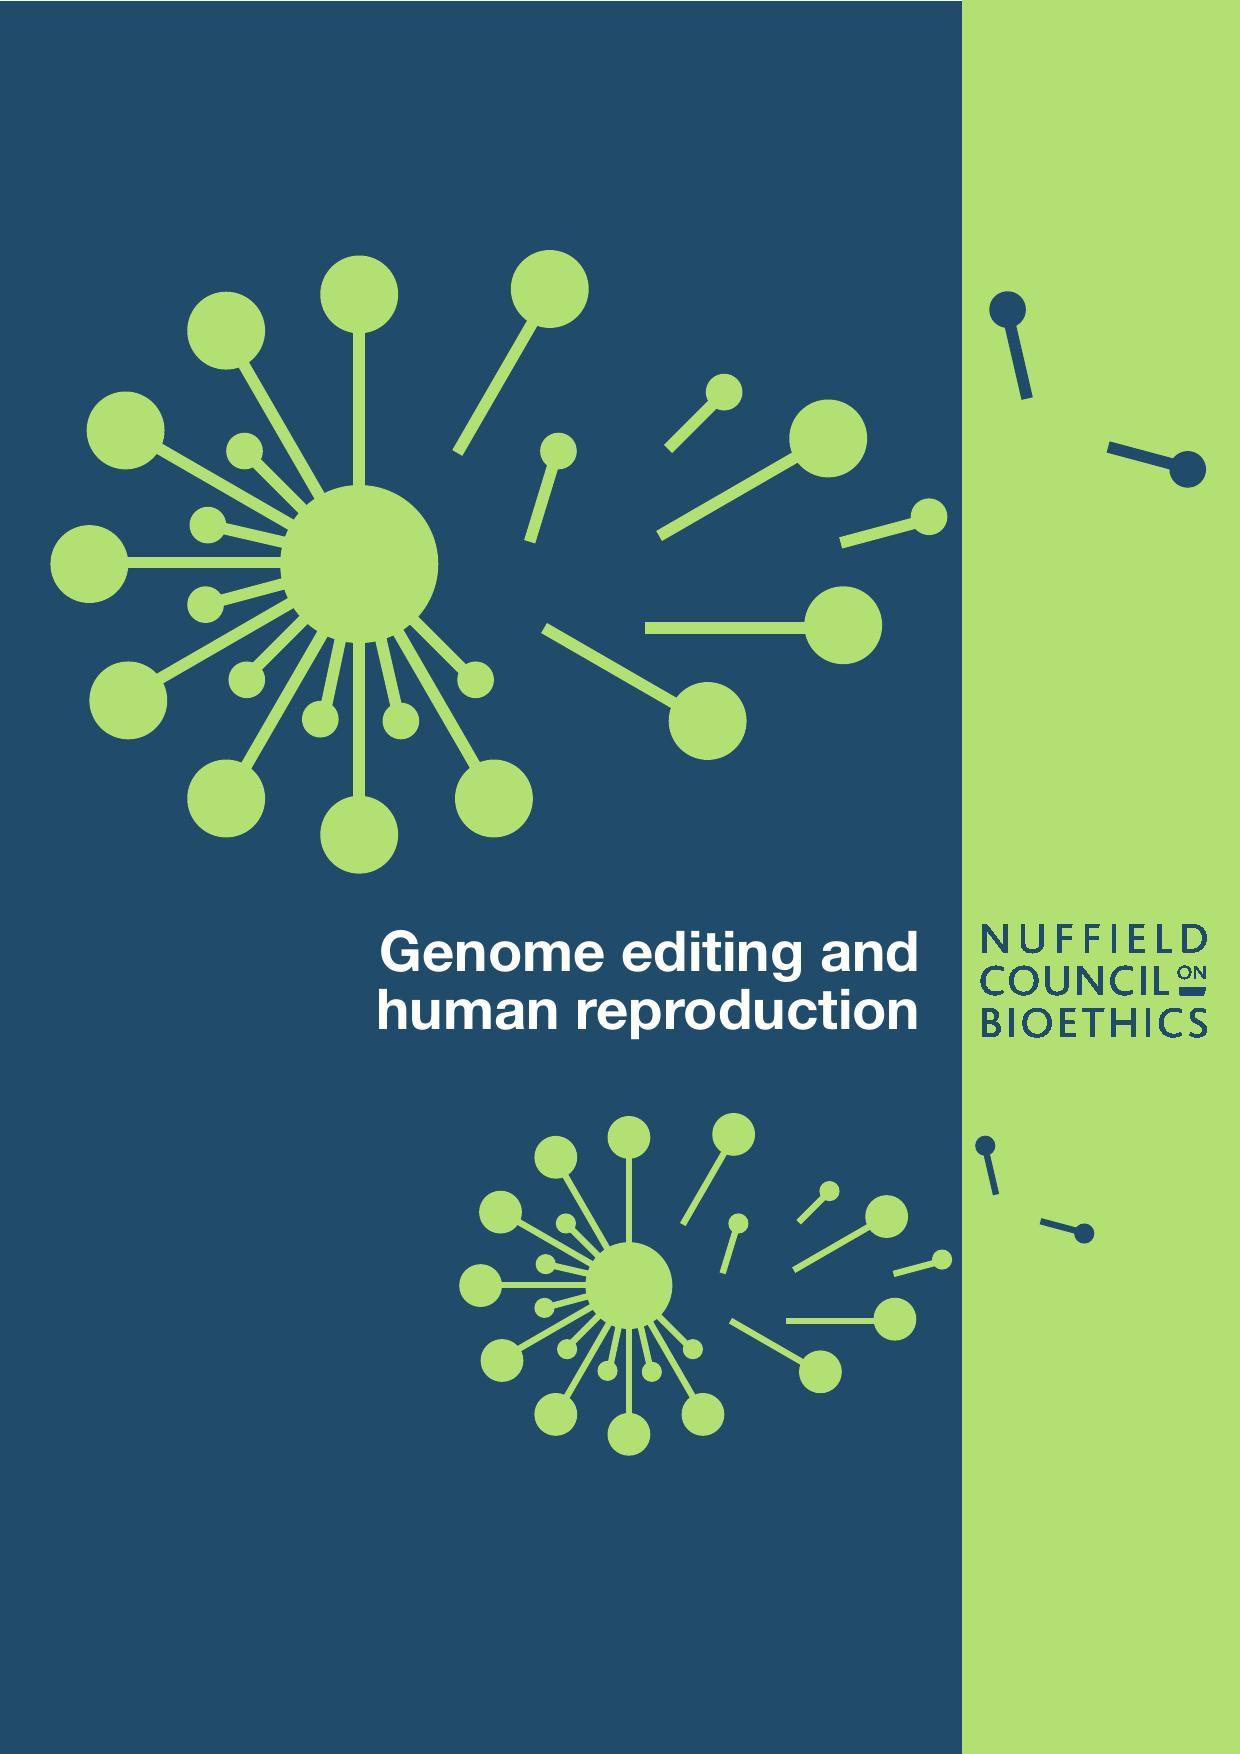 Genome editing and human reproduction